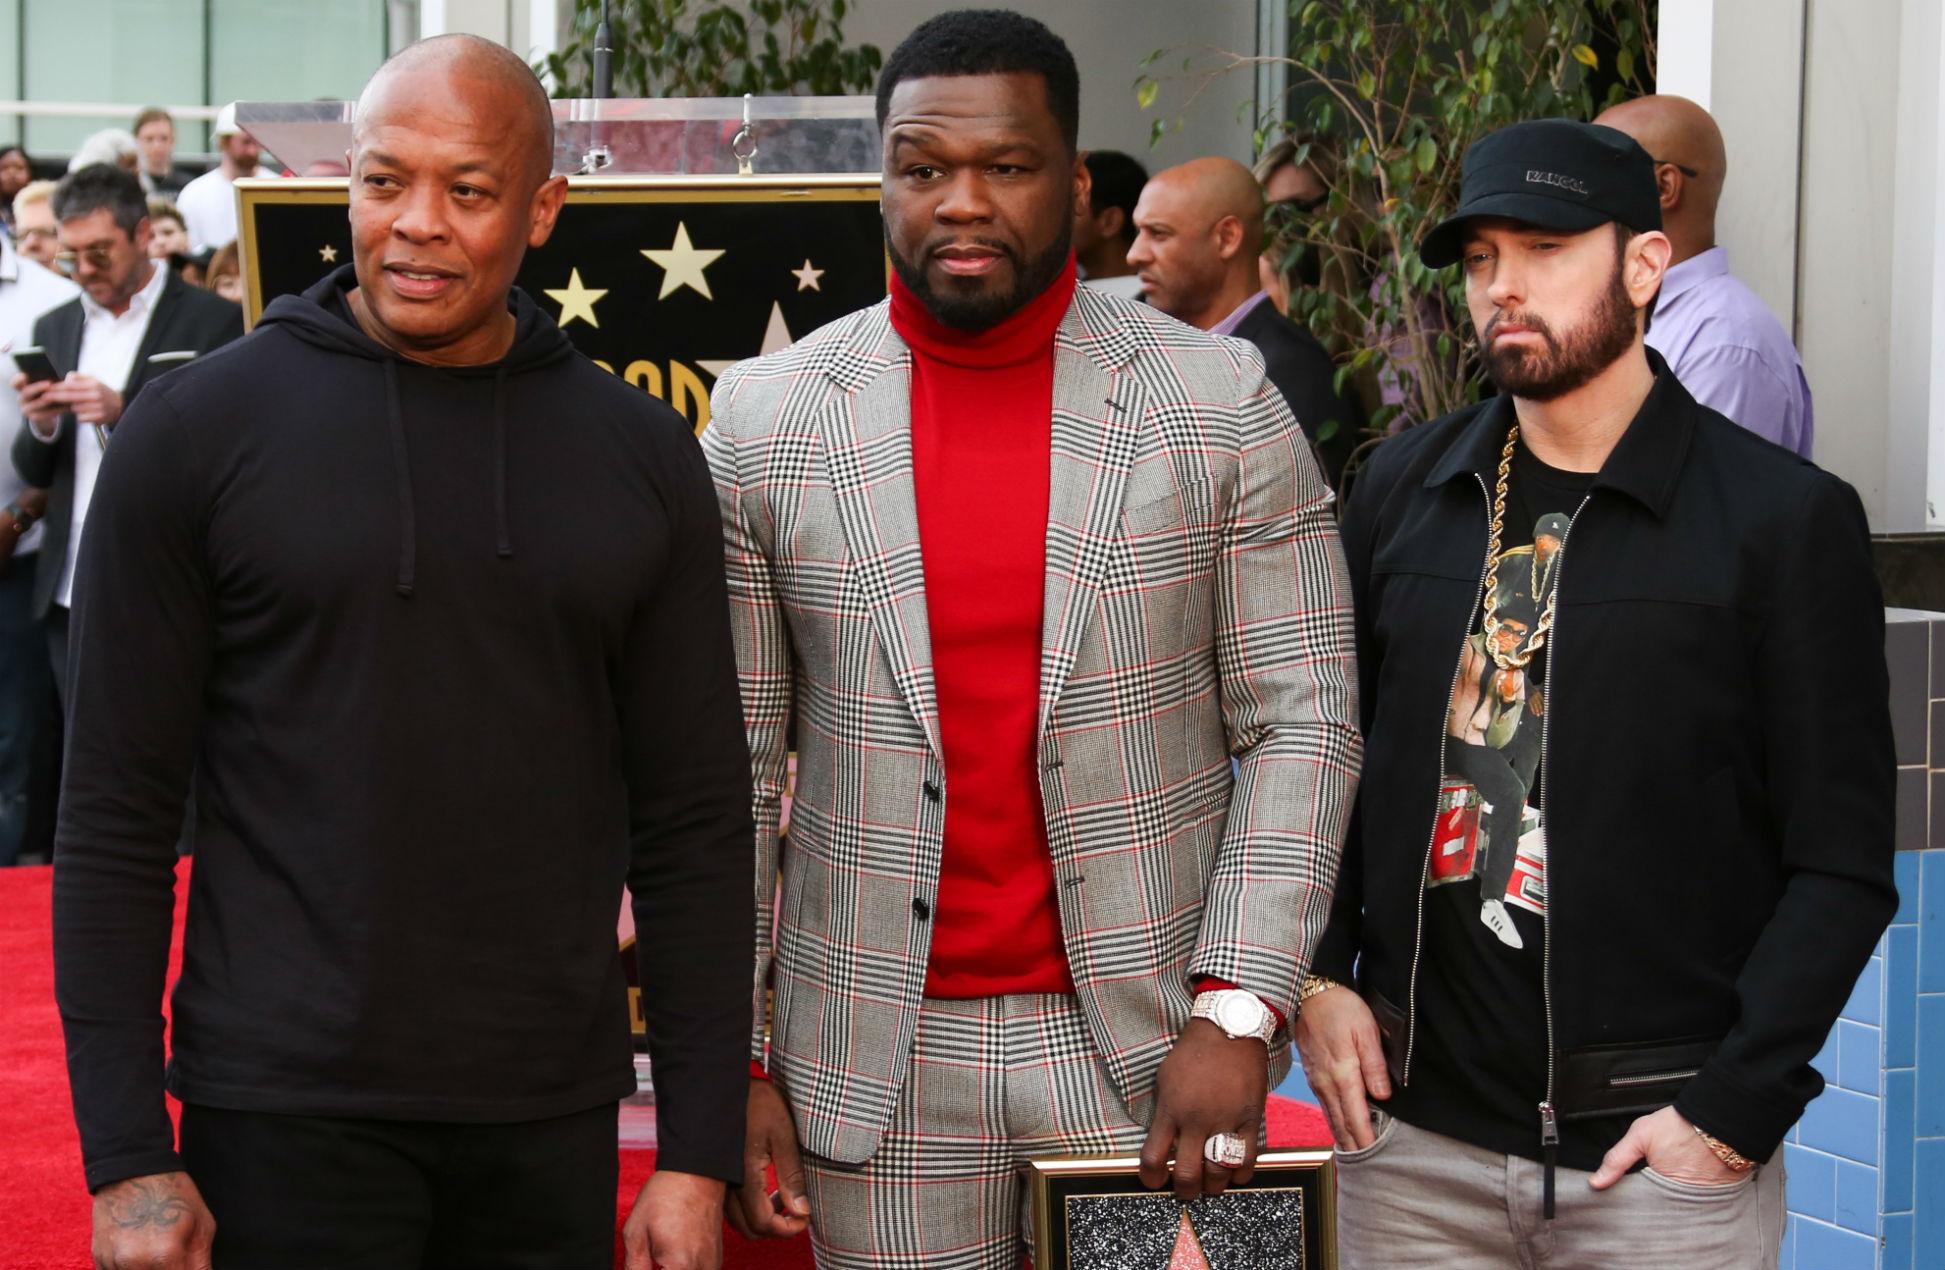 Dr Dre, 50 Cent and Eminem